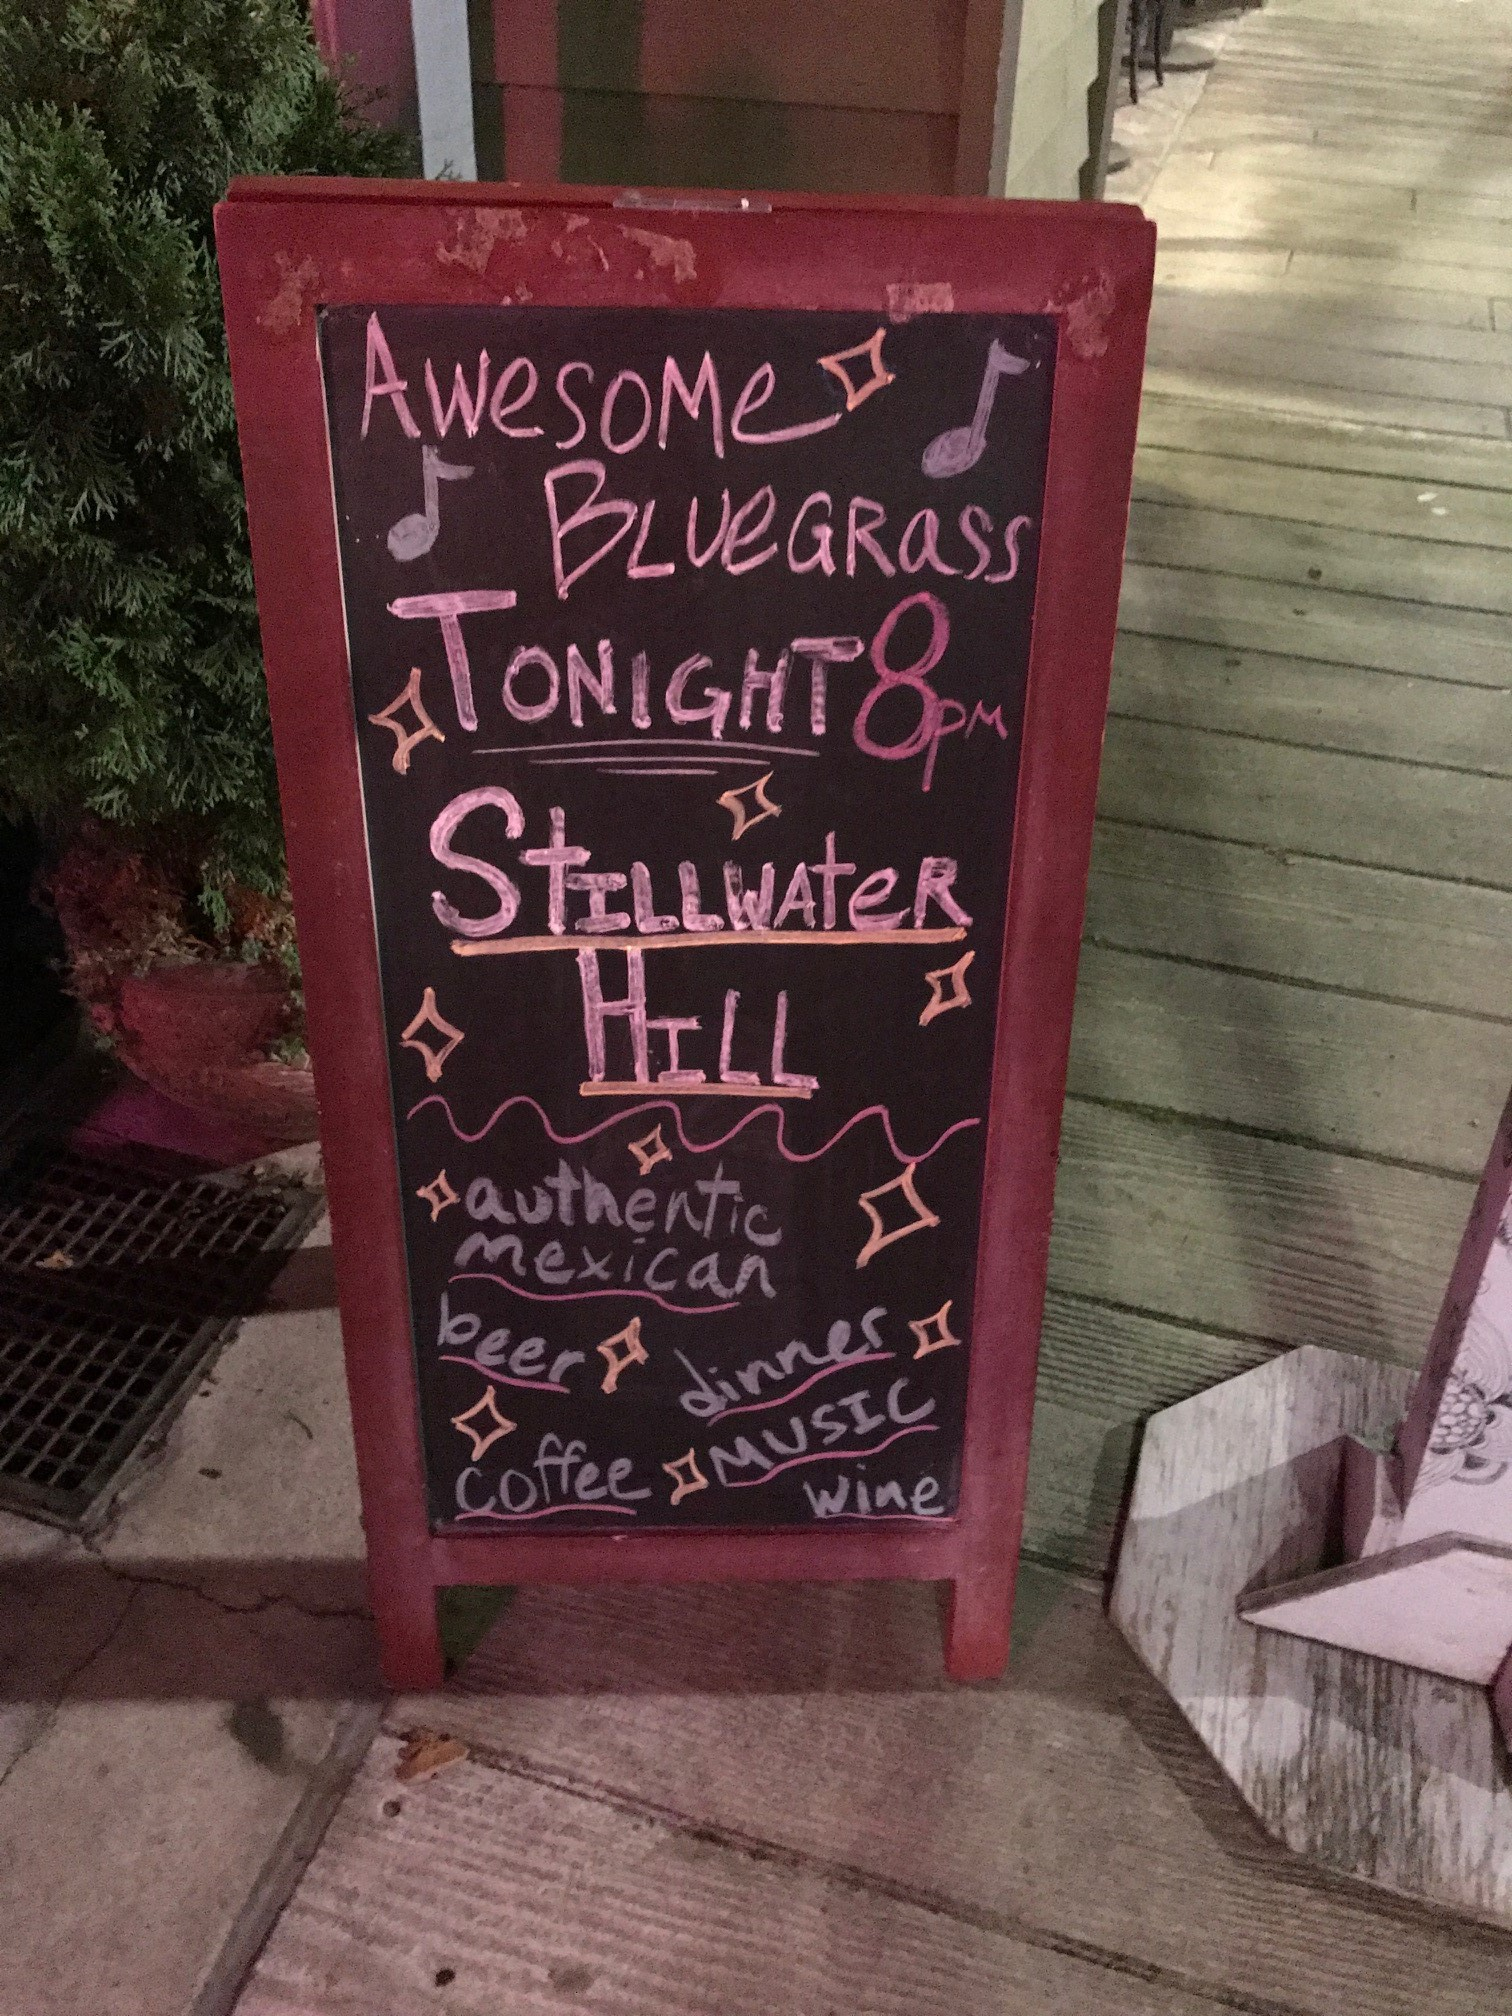 Stillwater Hill Live!